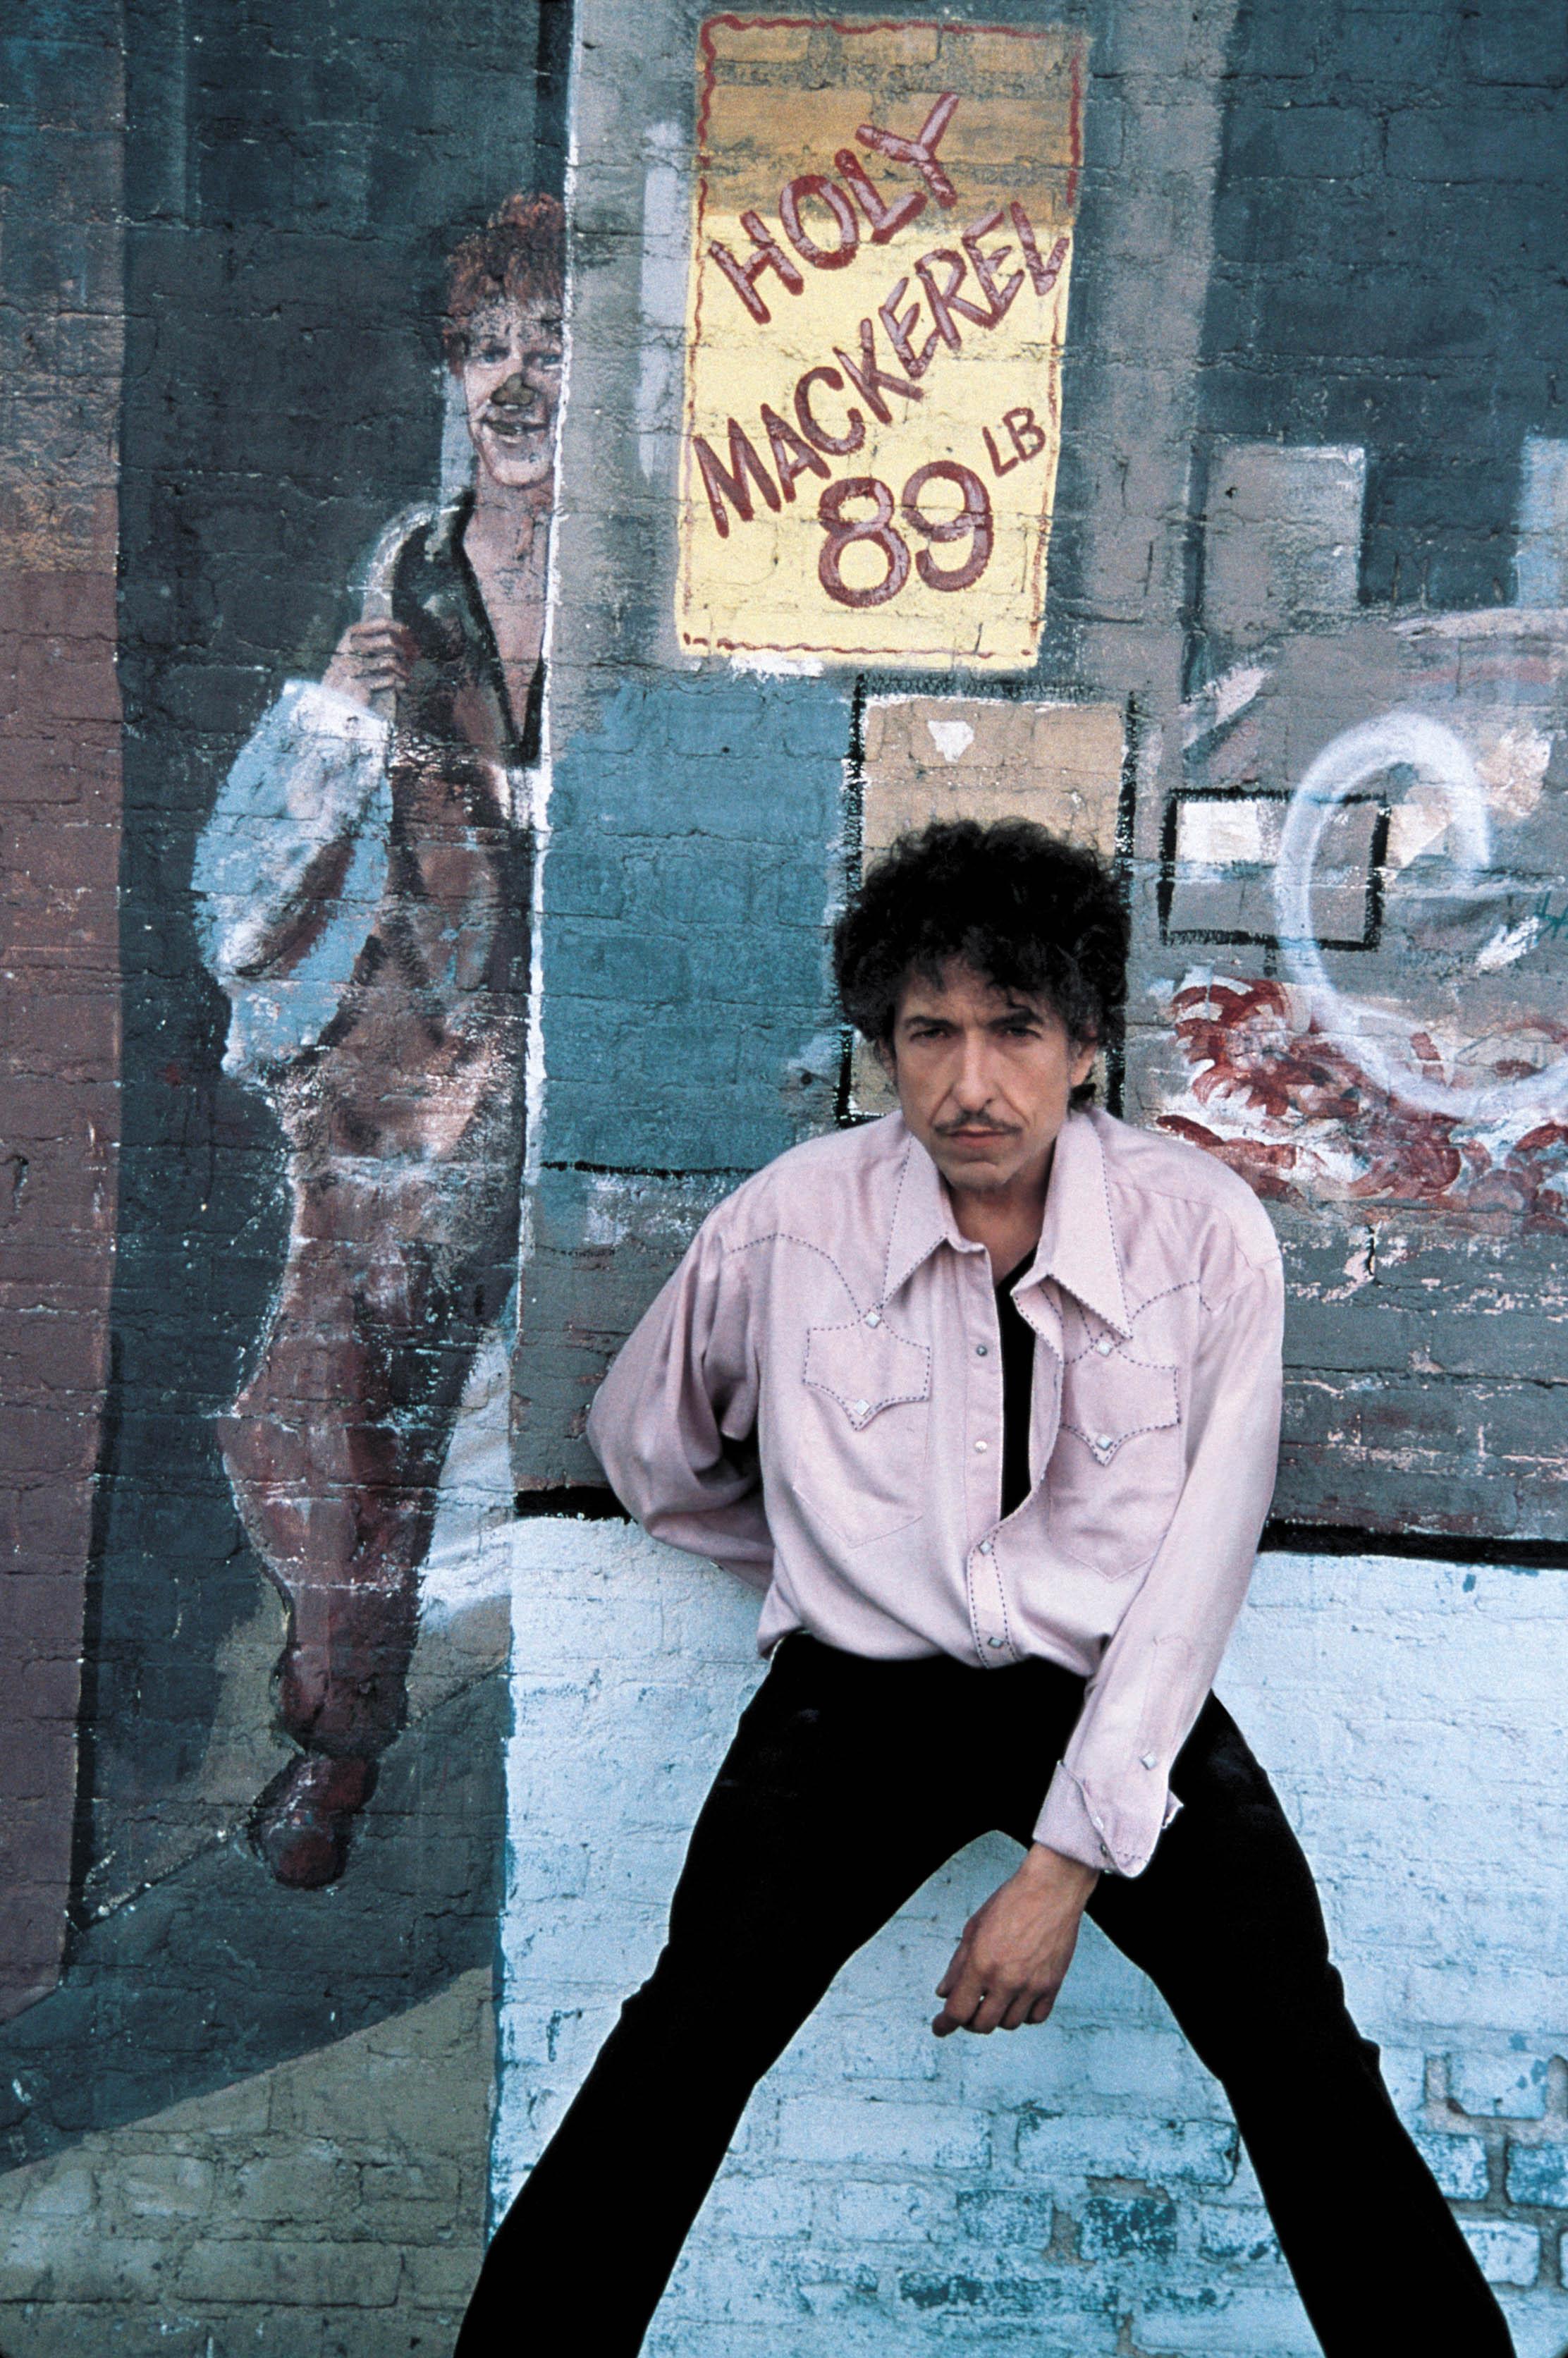 Bob_Dylan_2009____3